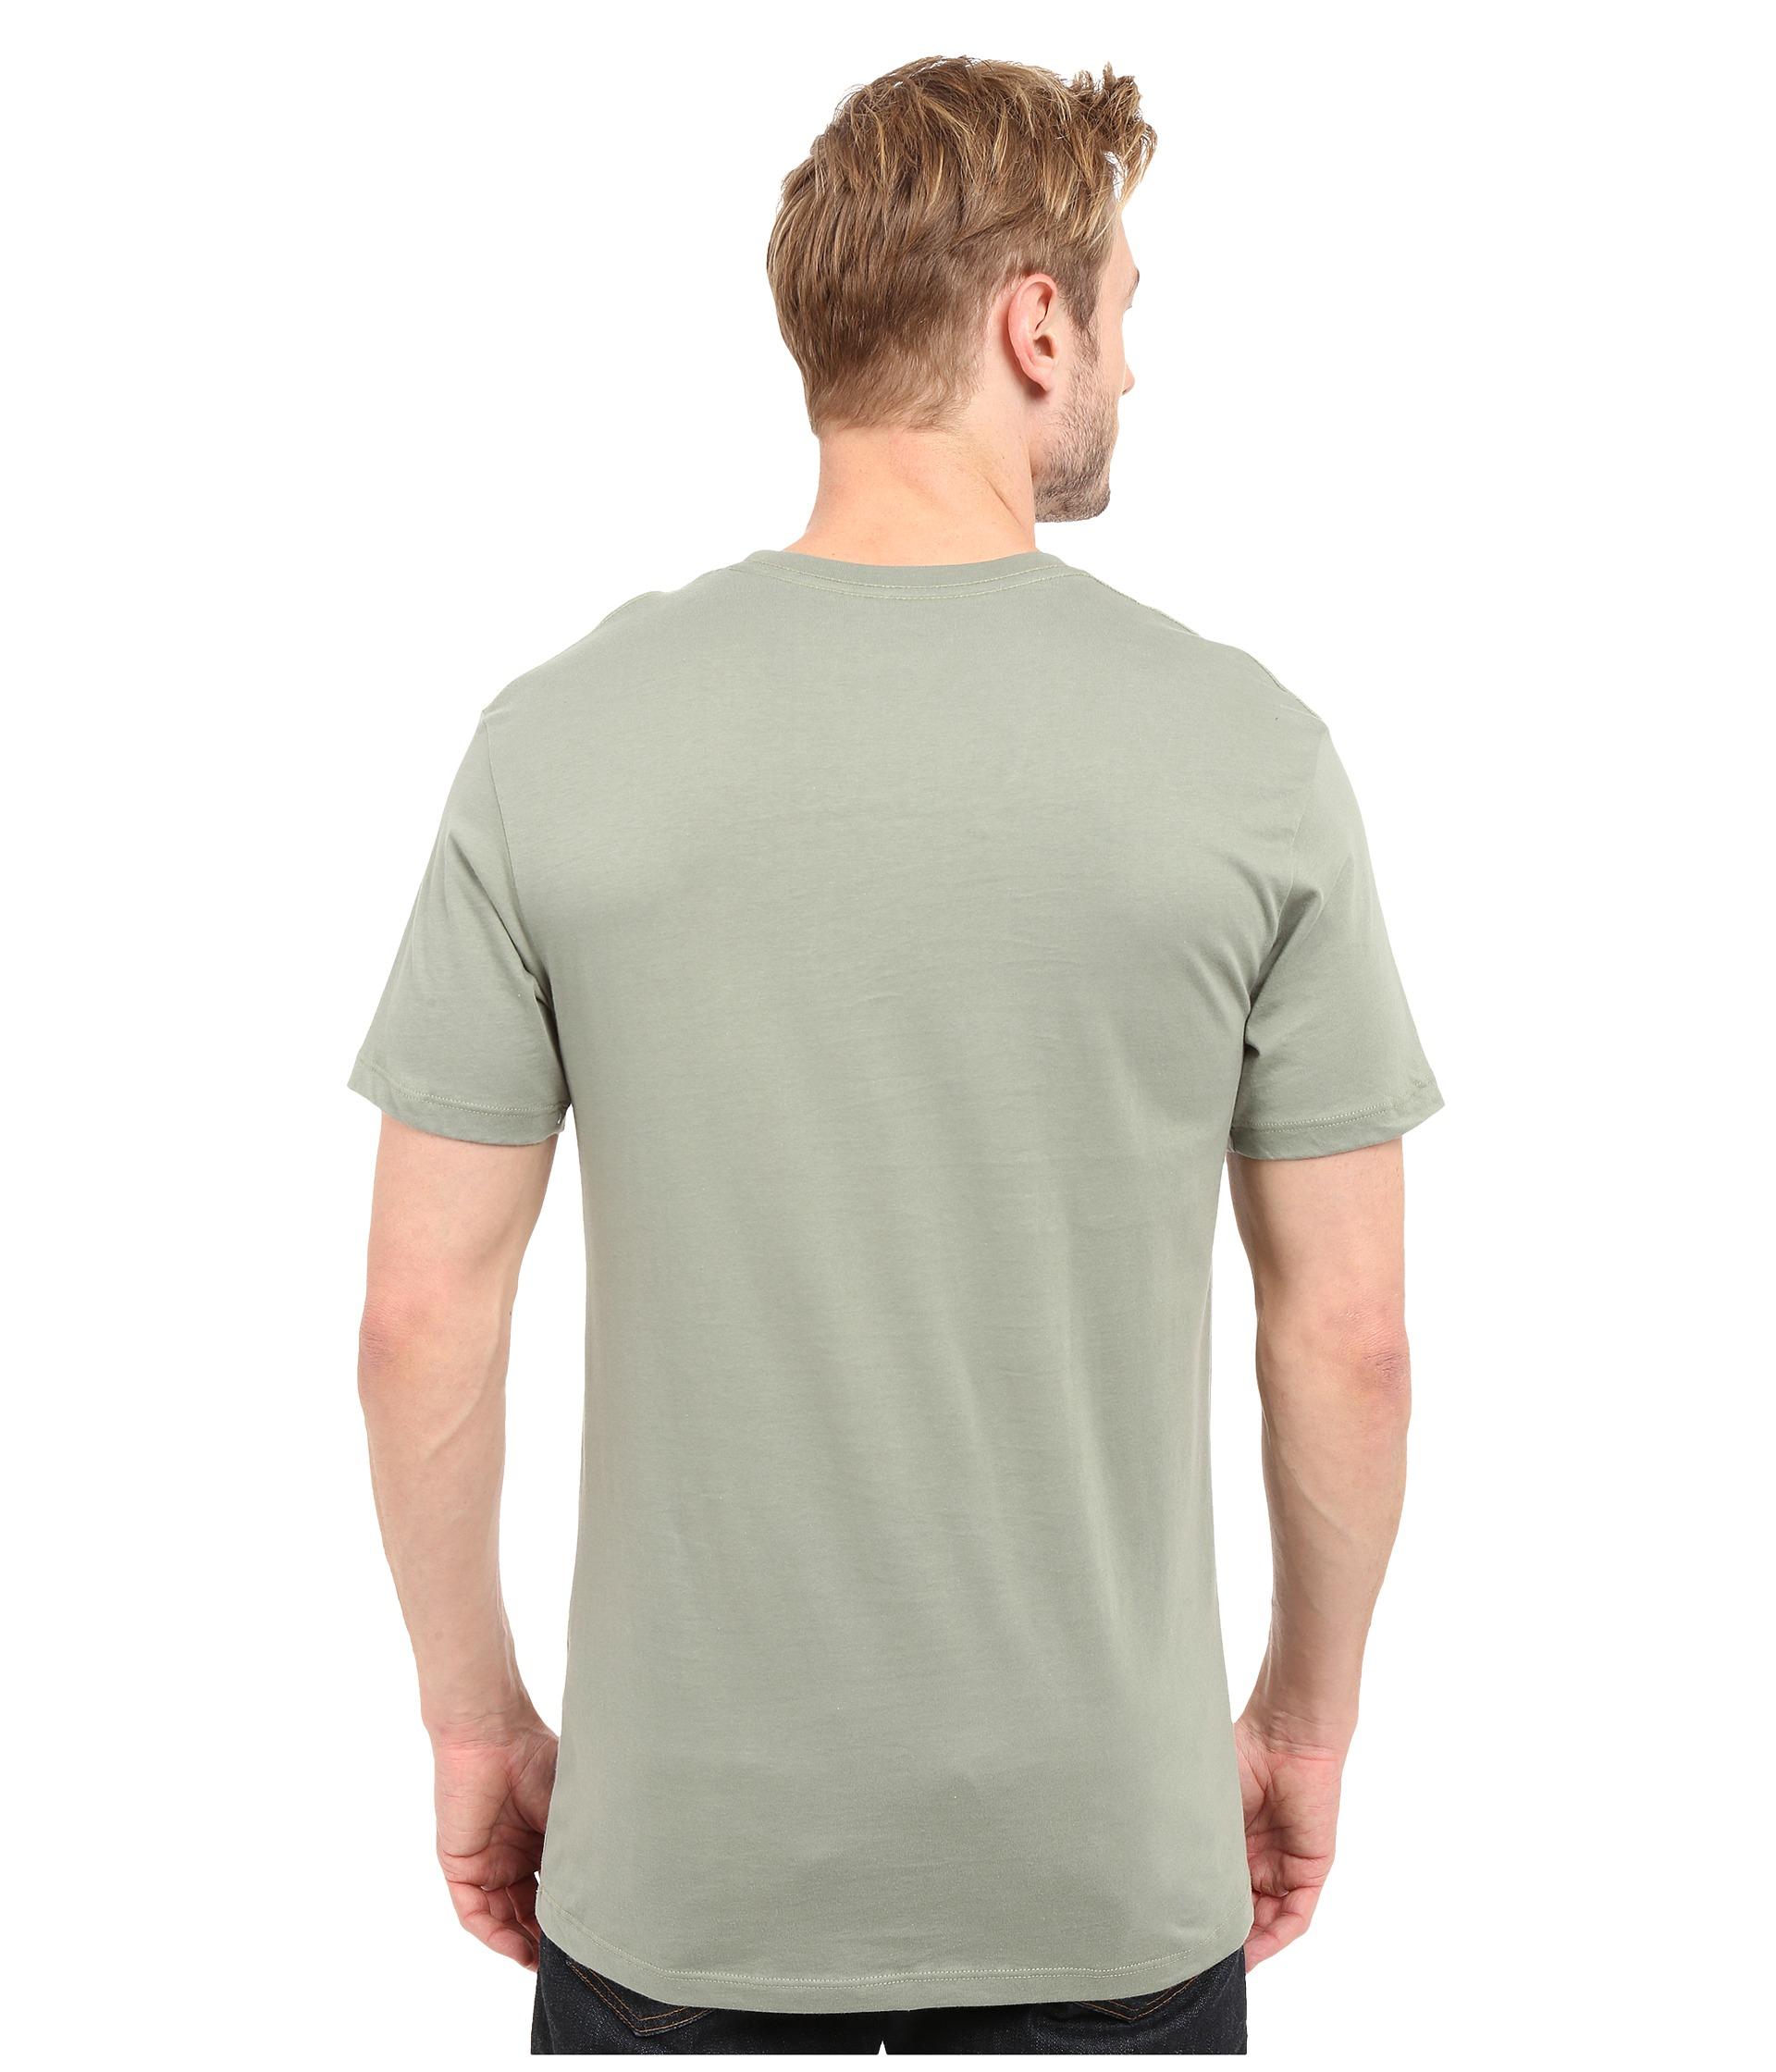 New fashion of shirt 97